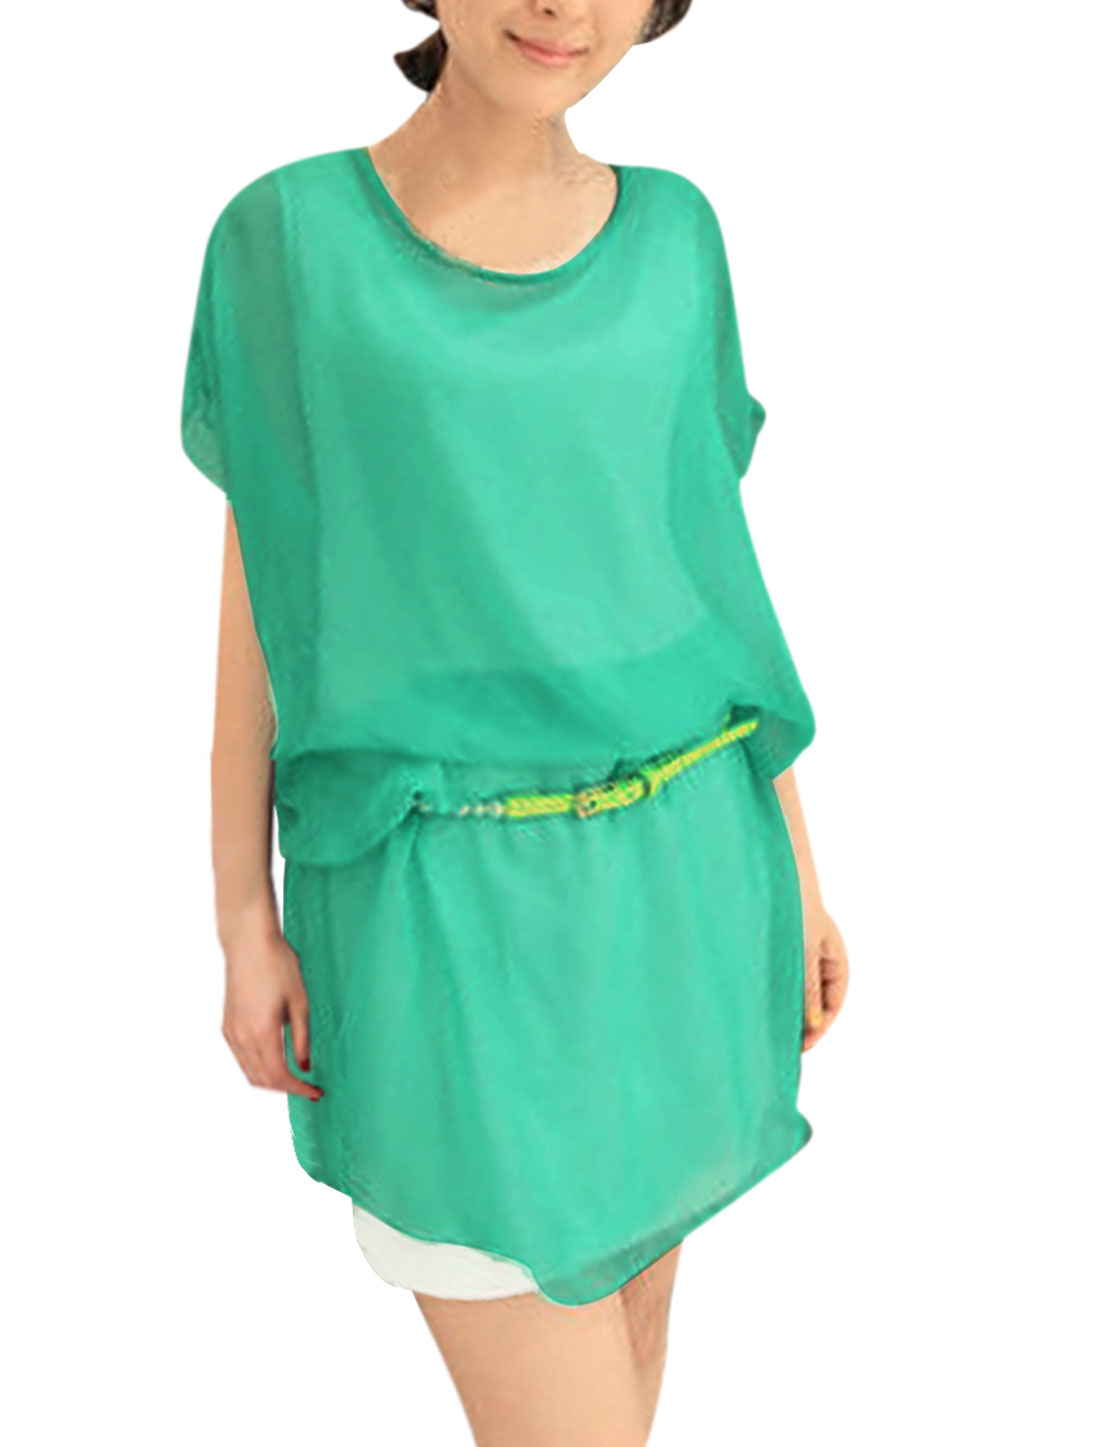 Ladies Above Knee Dipped Hem Chiffon Round Neck Dress Green XS